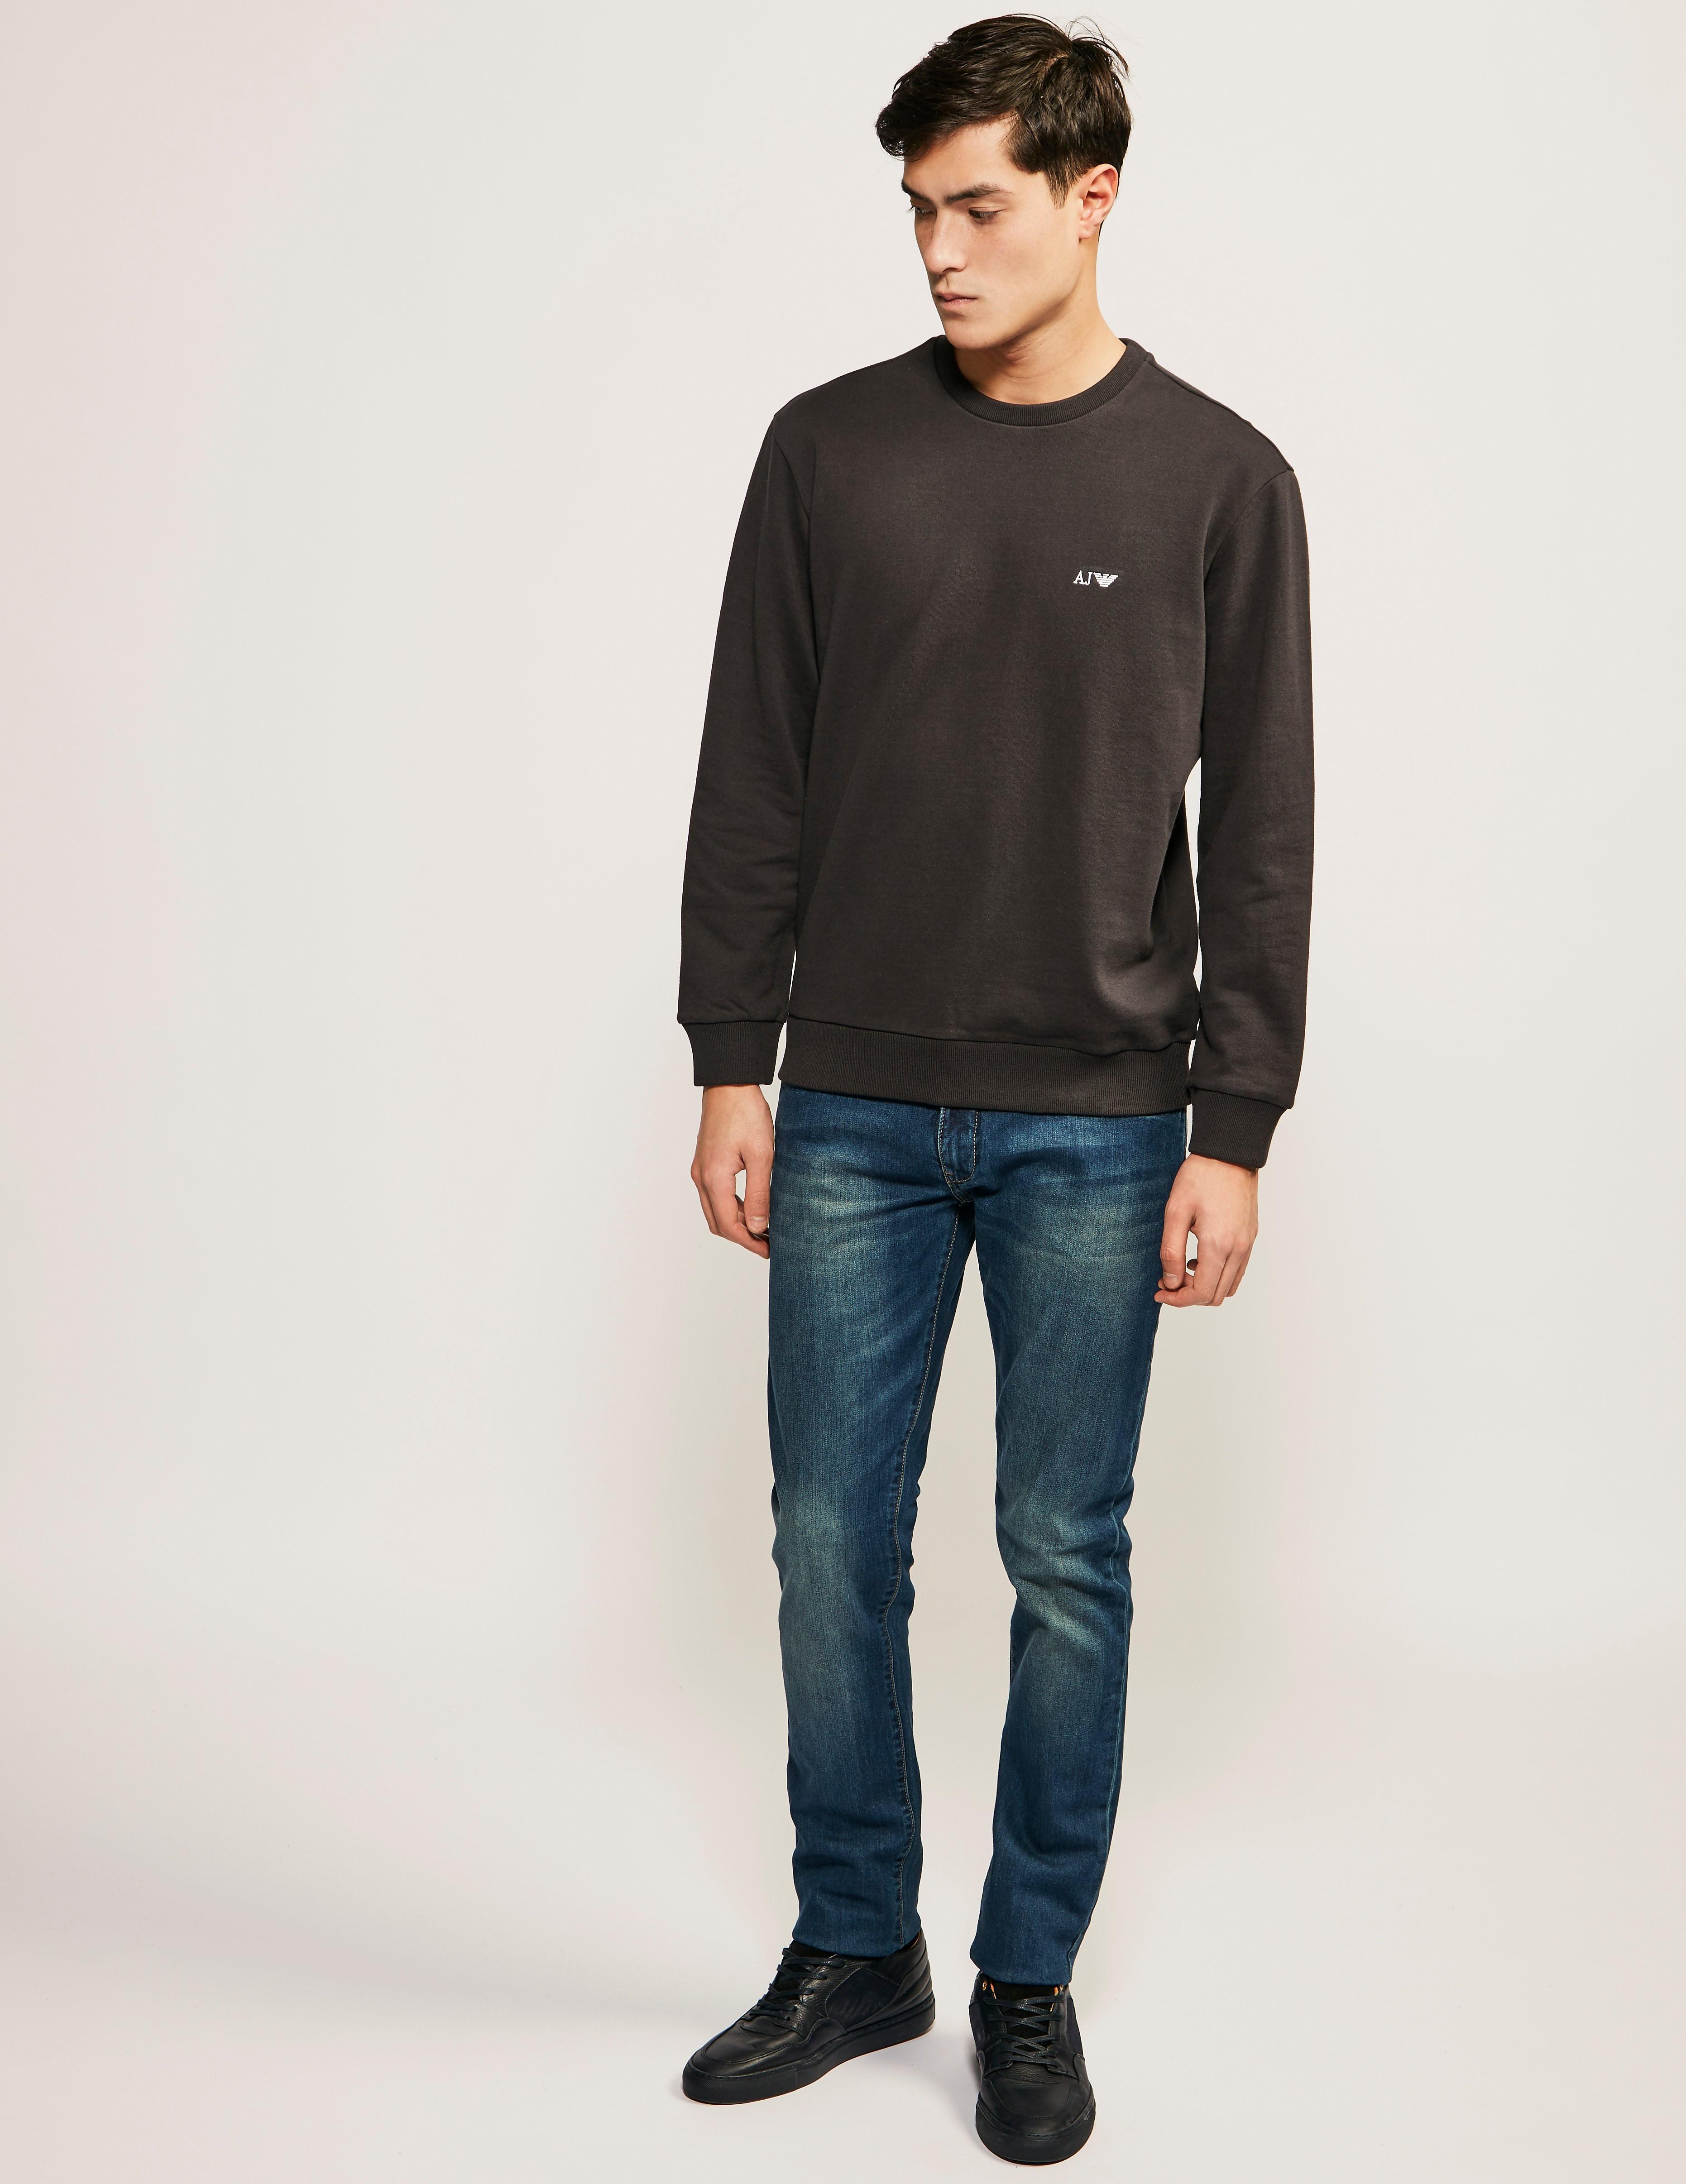 Armani Jeans J10 Midwash Extra Slim Jeans